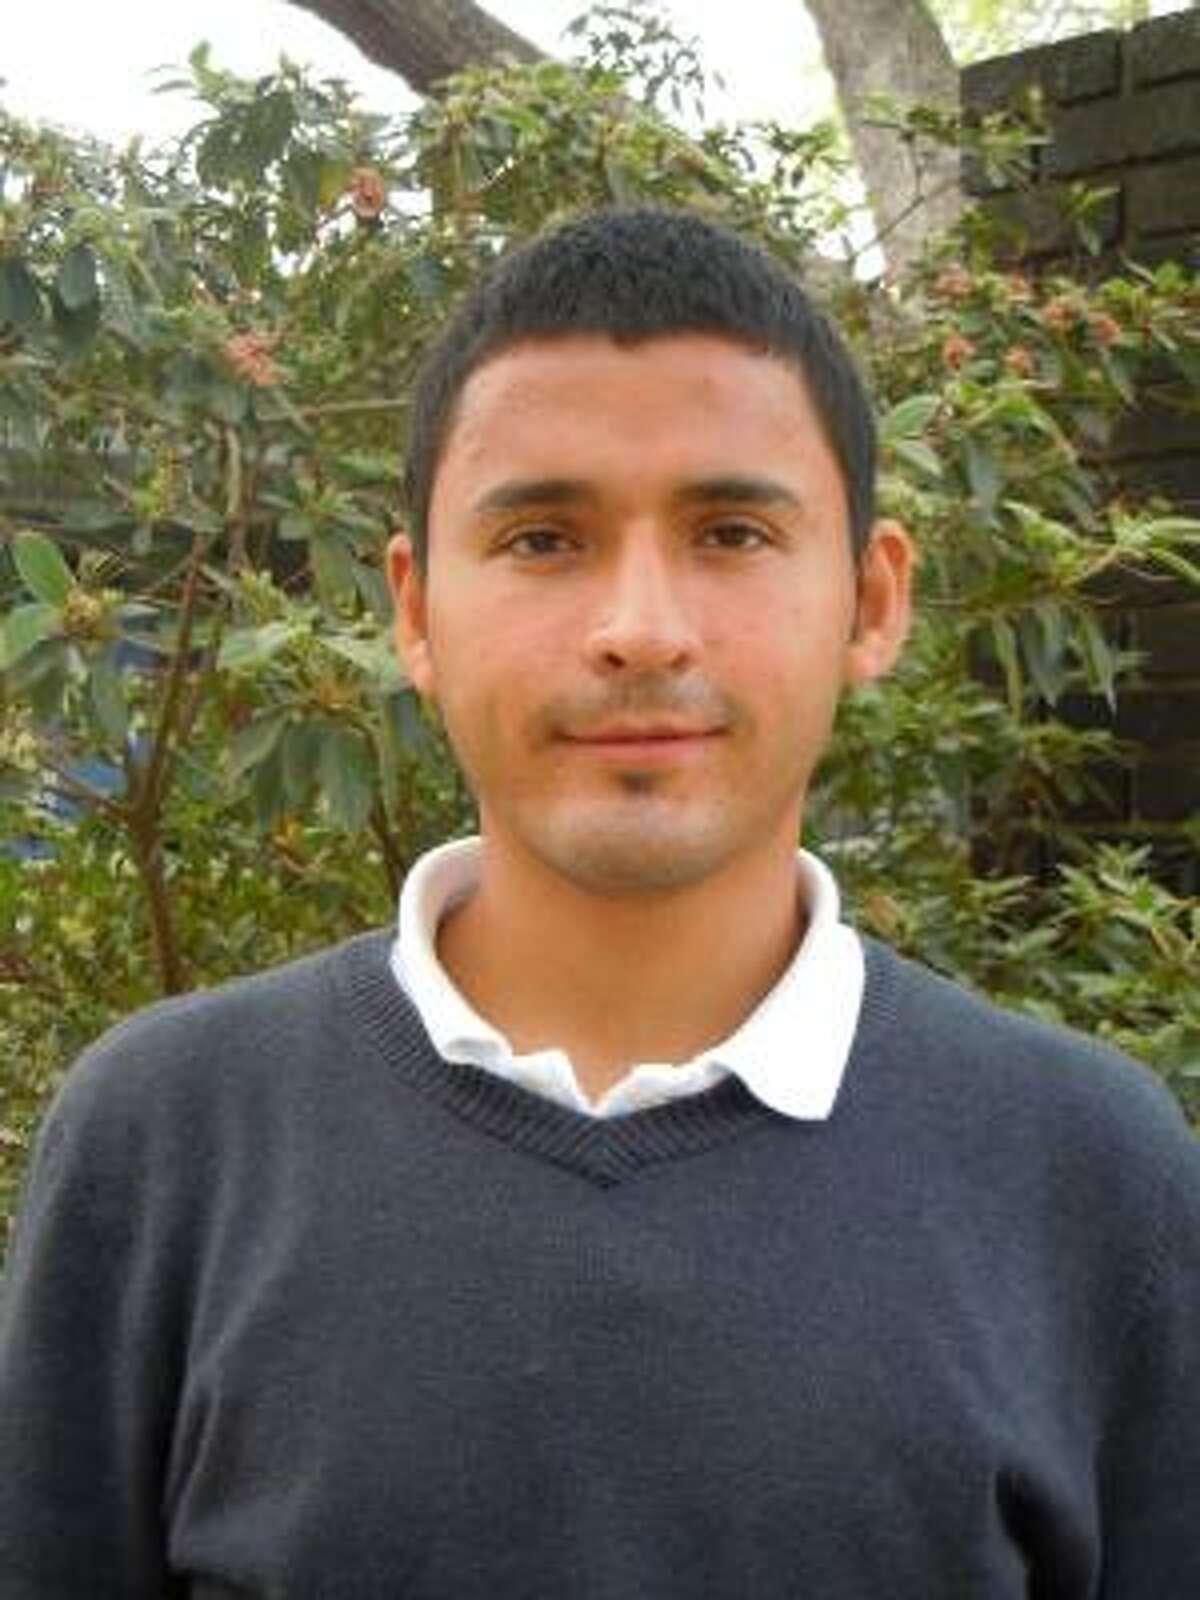 Fabian Medina, Alvin ISD's ASSETS AcademyClass rank: Valedictorian